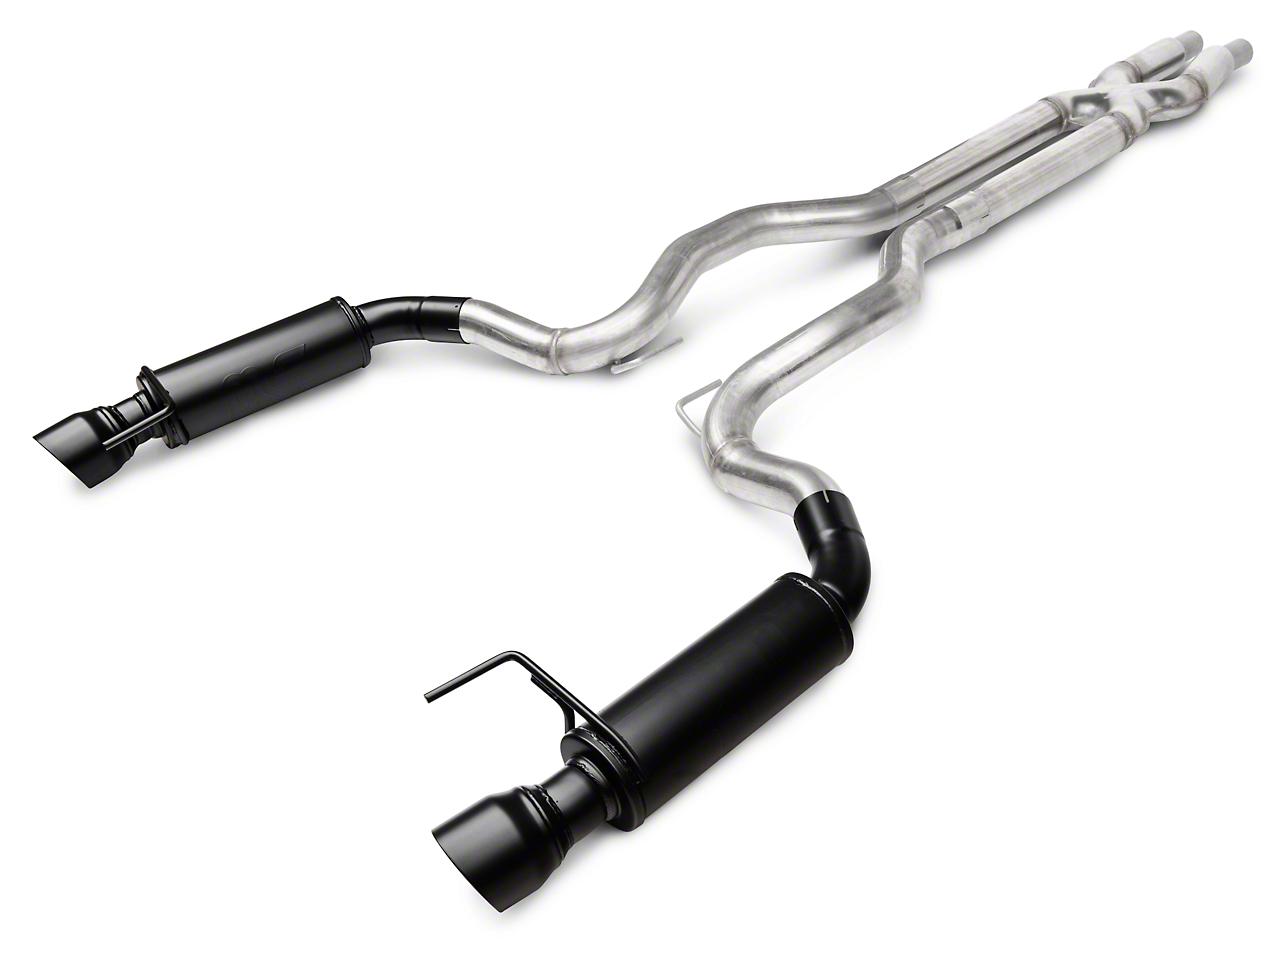 Magnaflow Competition Cat-Back Exhaust - Black Tips (15-17 GT)